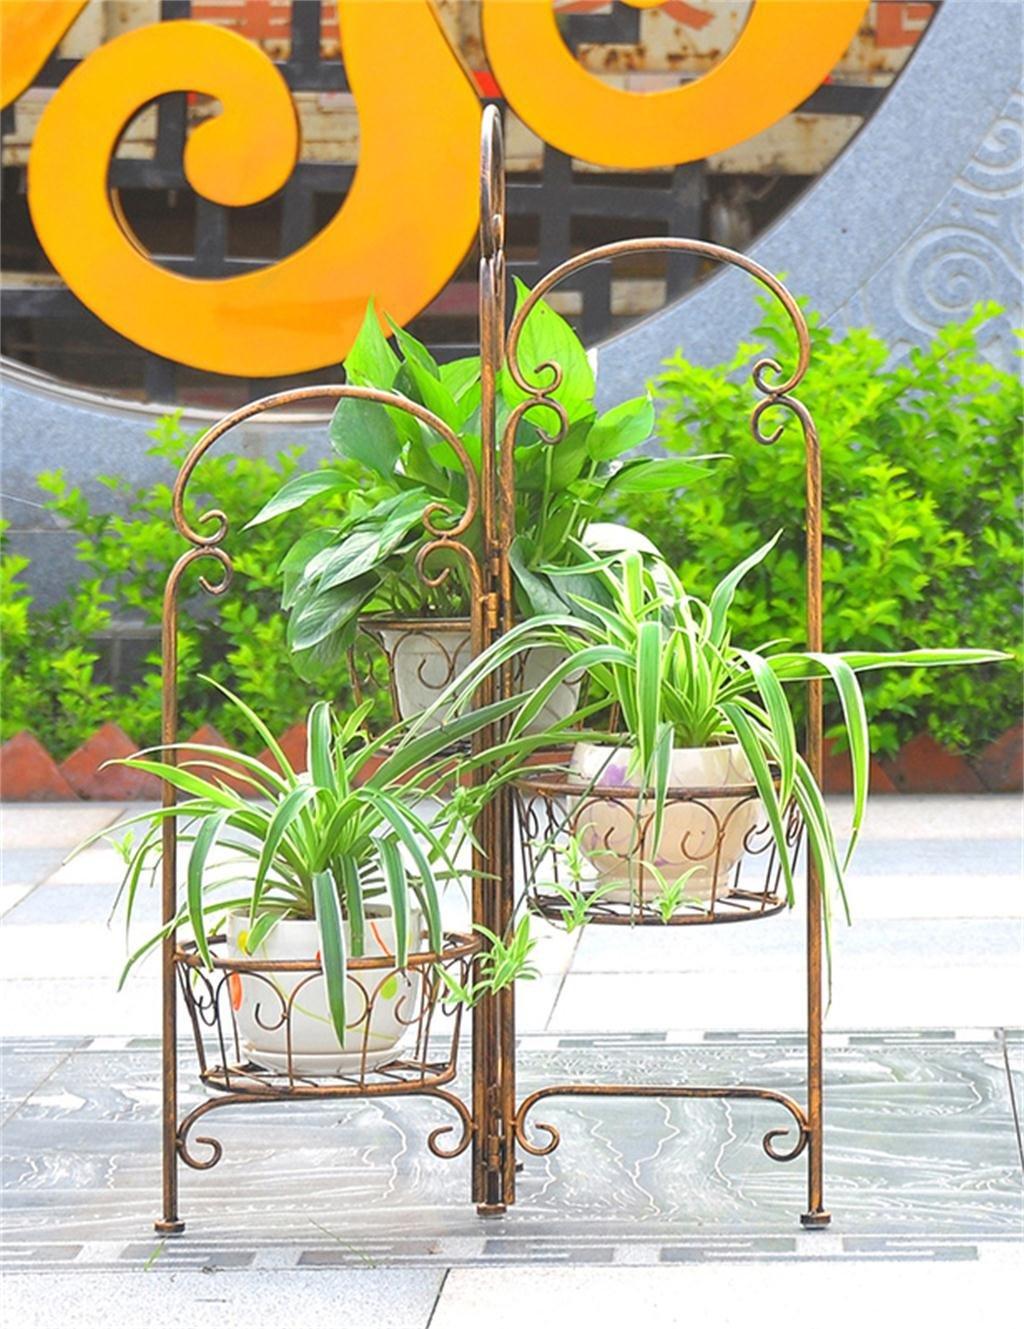 LB Ferro Flower Pot Holder Flower Pot stand europeo creativo Soggiorno Balcone Flower Pot Shelf Mens